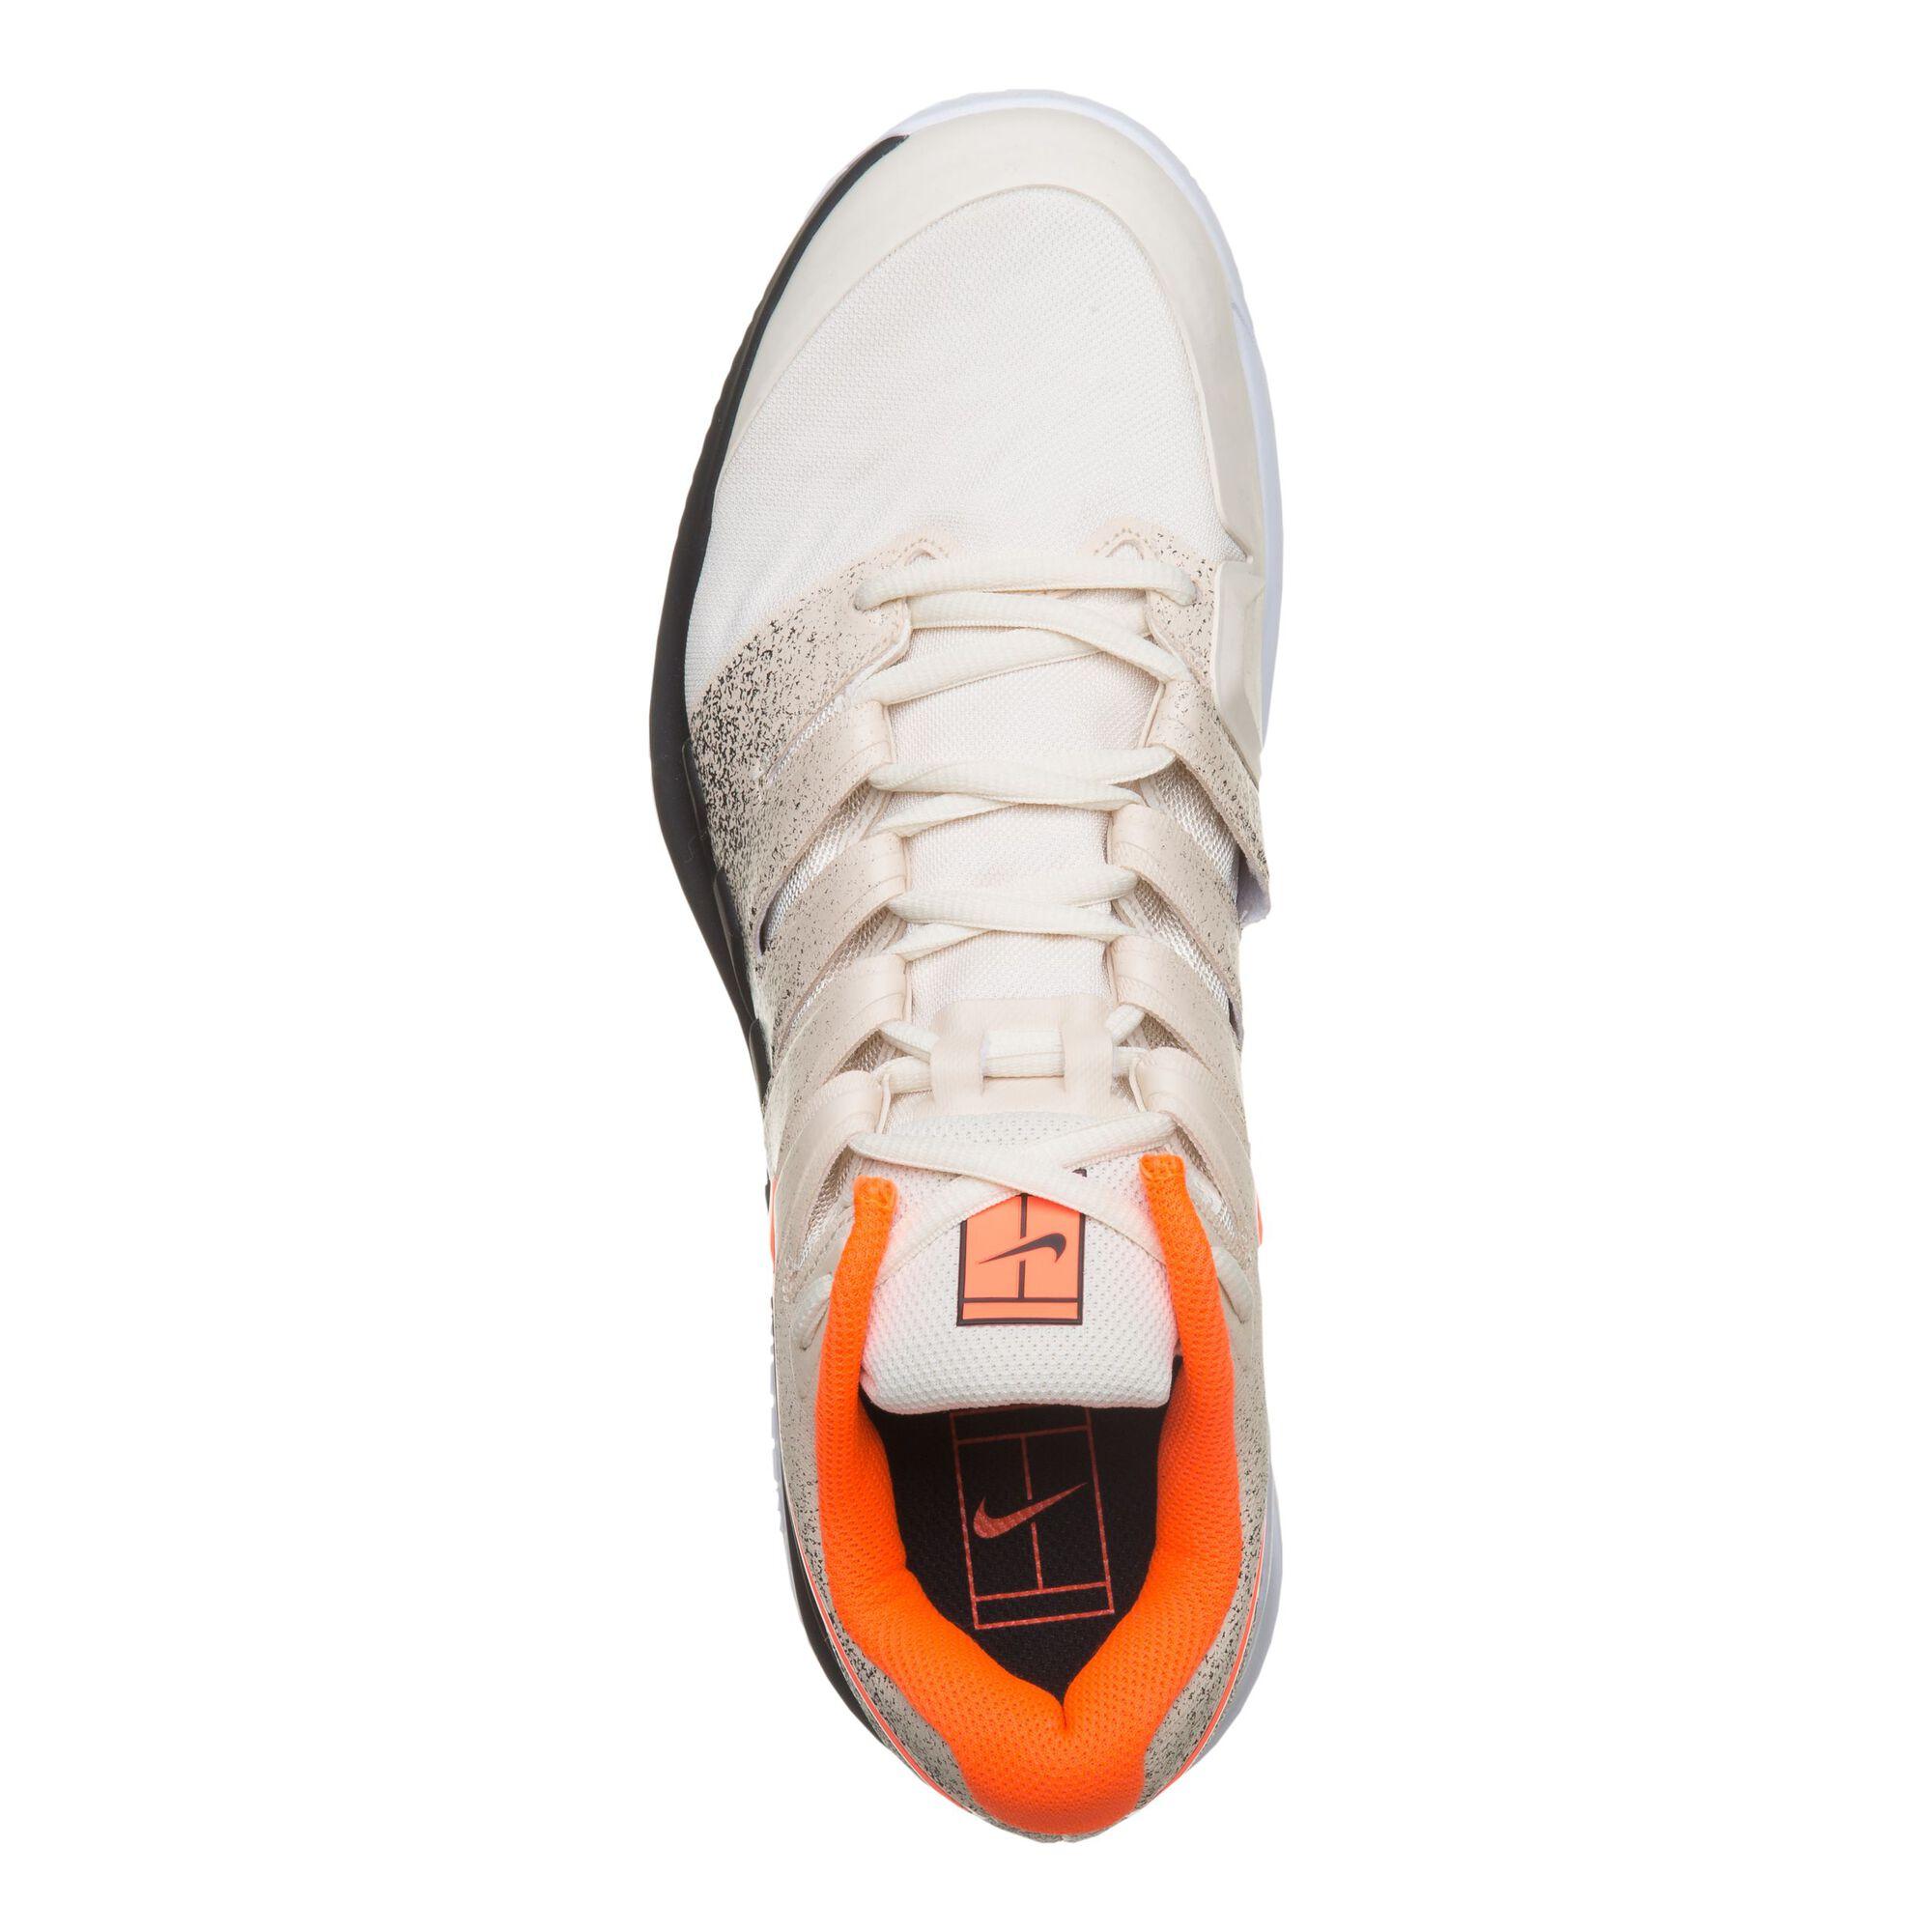 new styles 680d0 50401 ... Nike  Nike  Nike  Nike  Nike  Nike. Air Zoom Vapor X ...